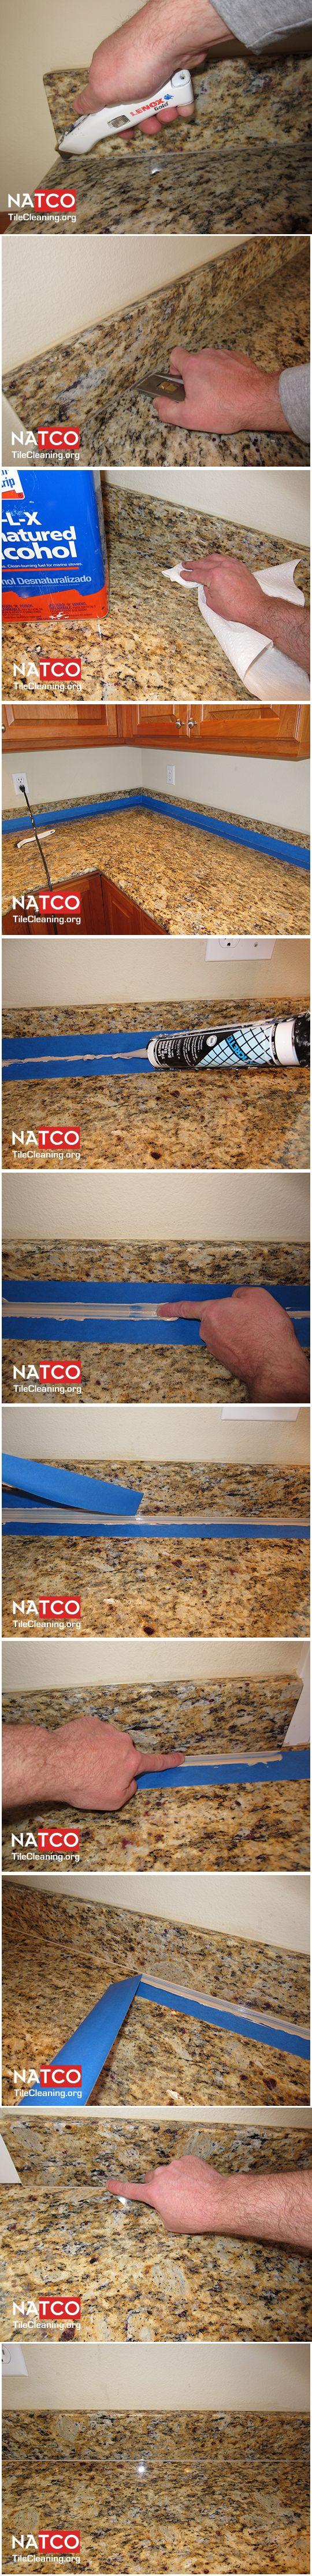 Professional Recaulking Procedure For Granite Countertops How To Clean Granite Cleaning Granite Countertops Organize Bathroom Countertop